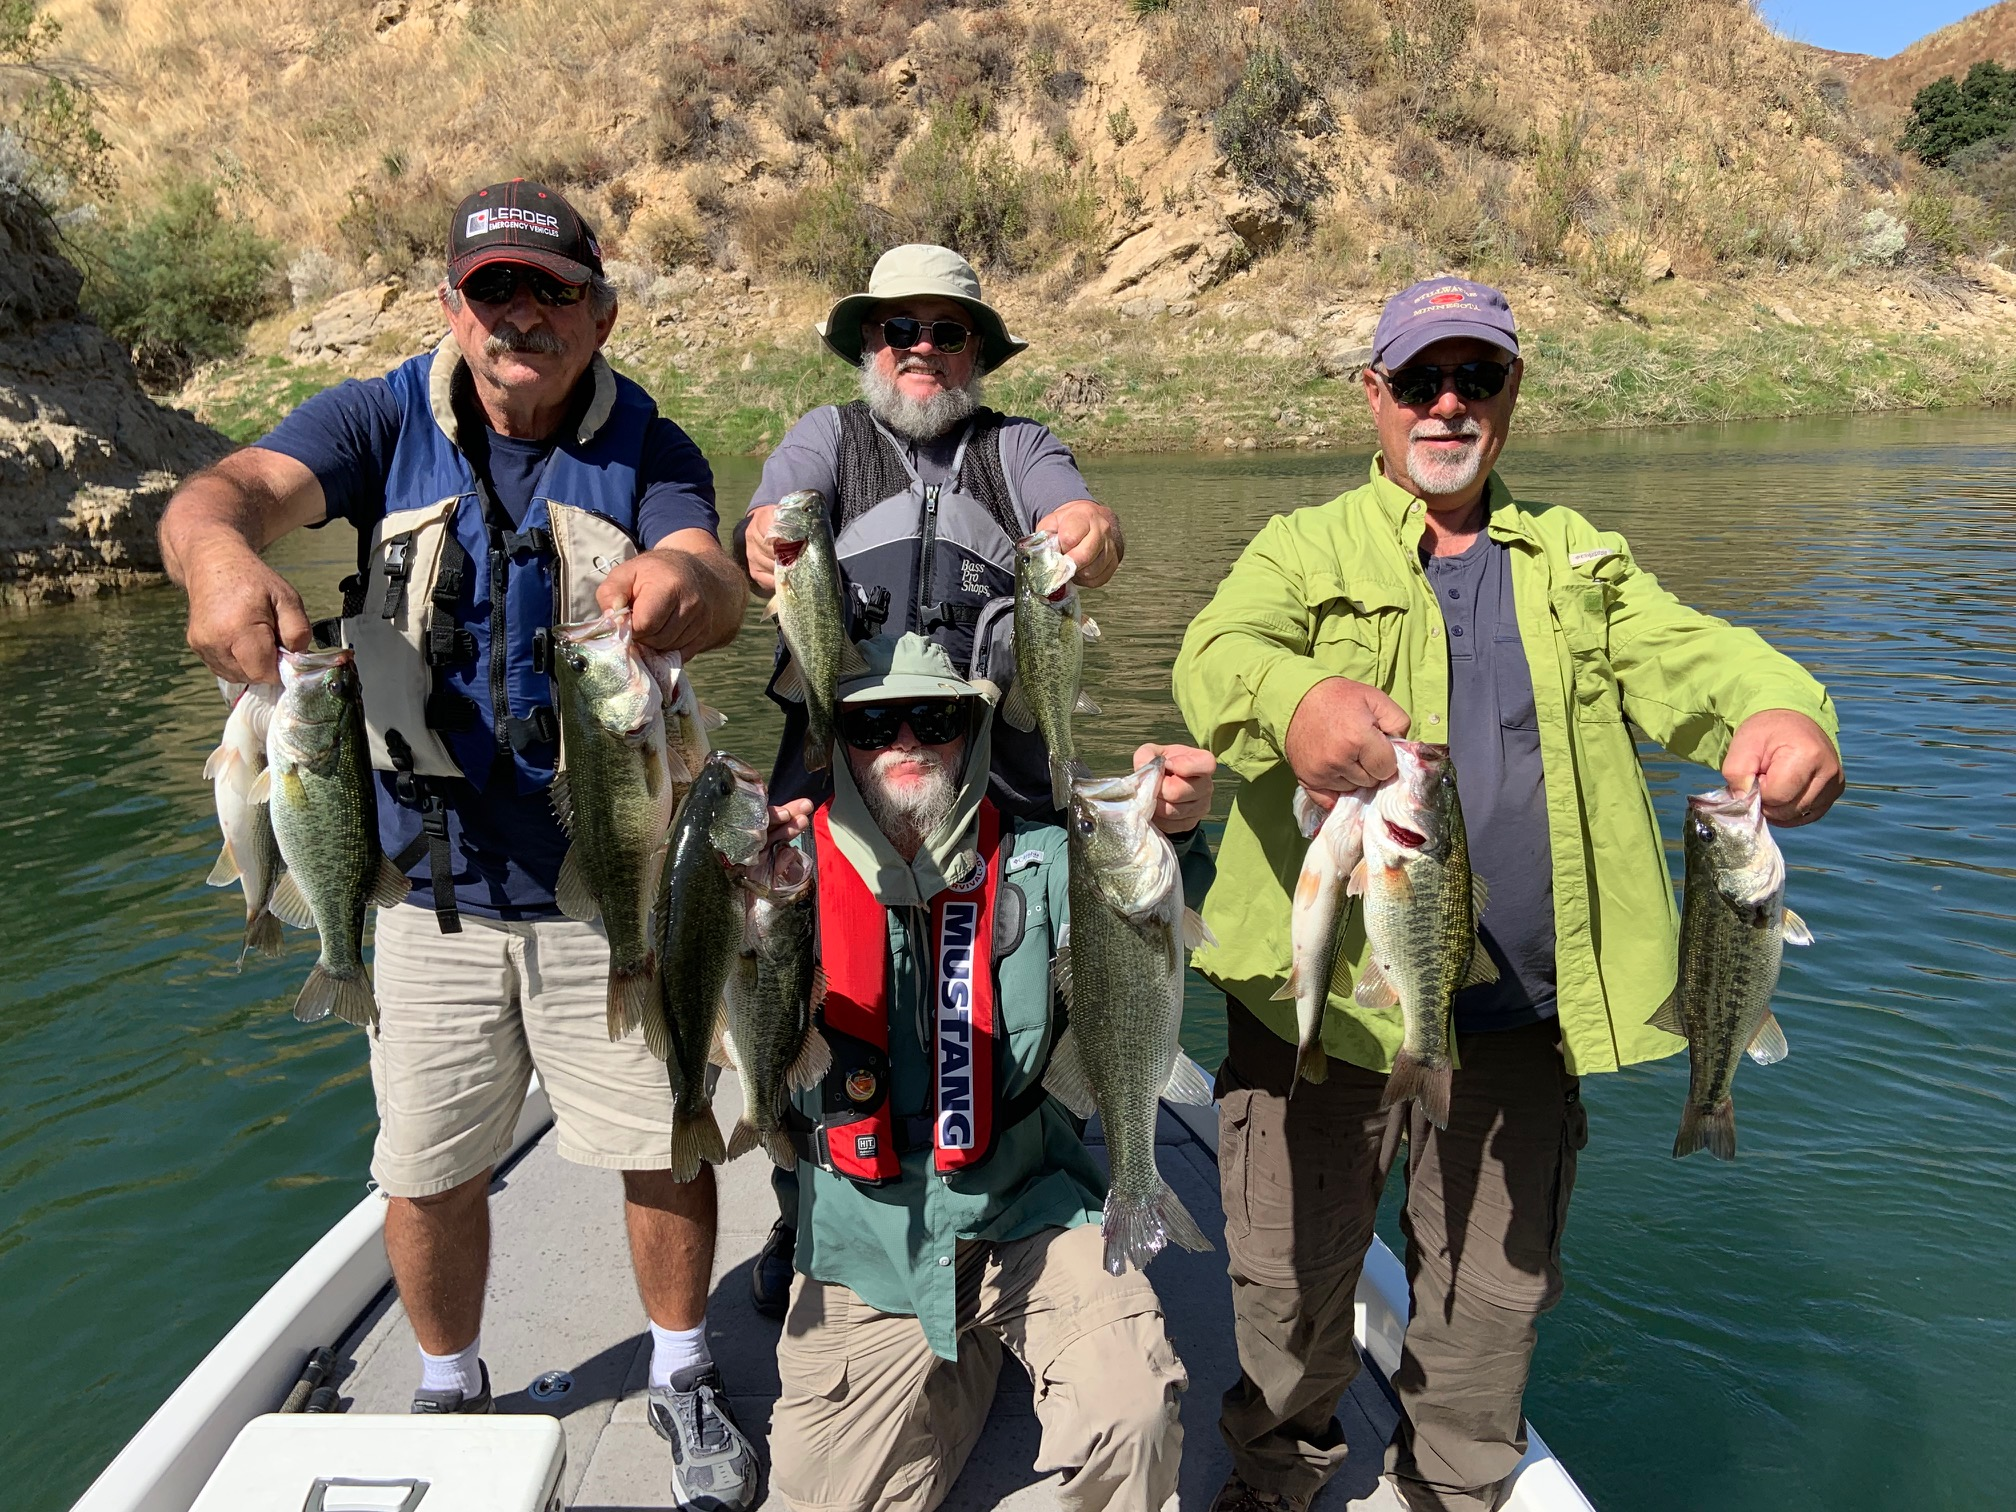 Castaic Lake Bass Fishing Guide 9/23/2019